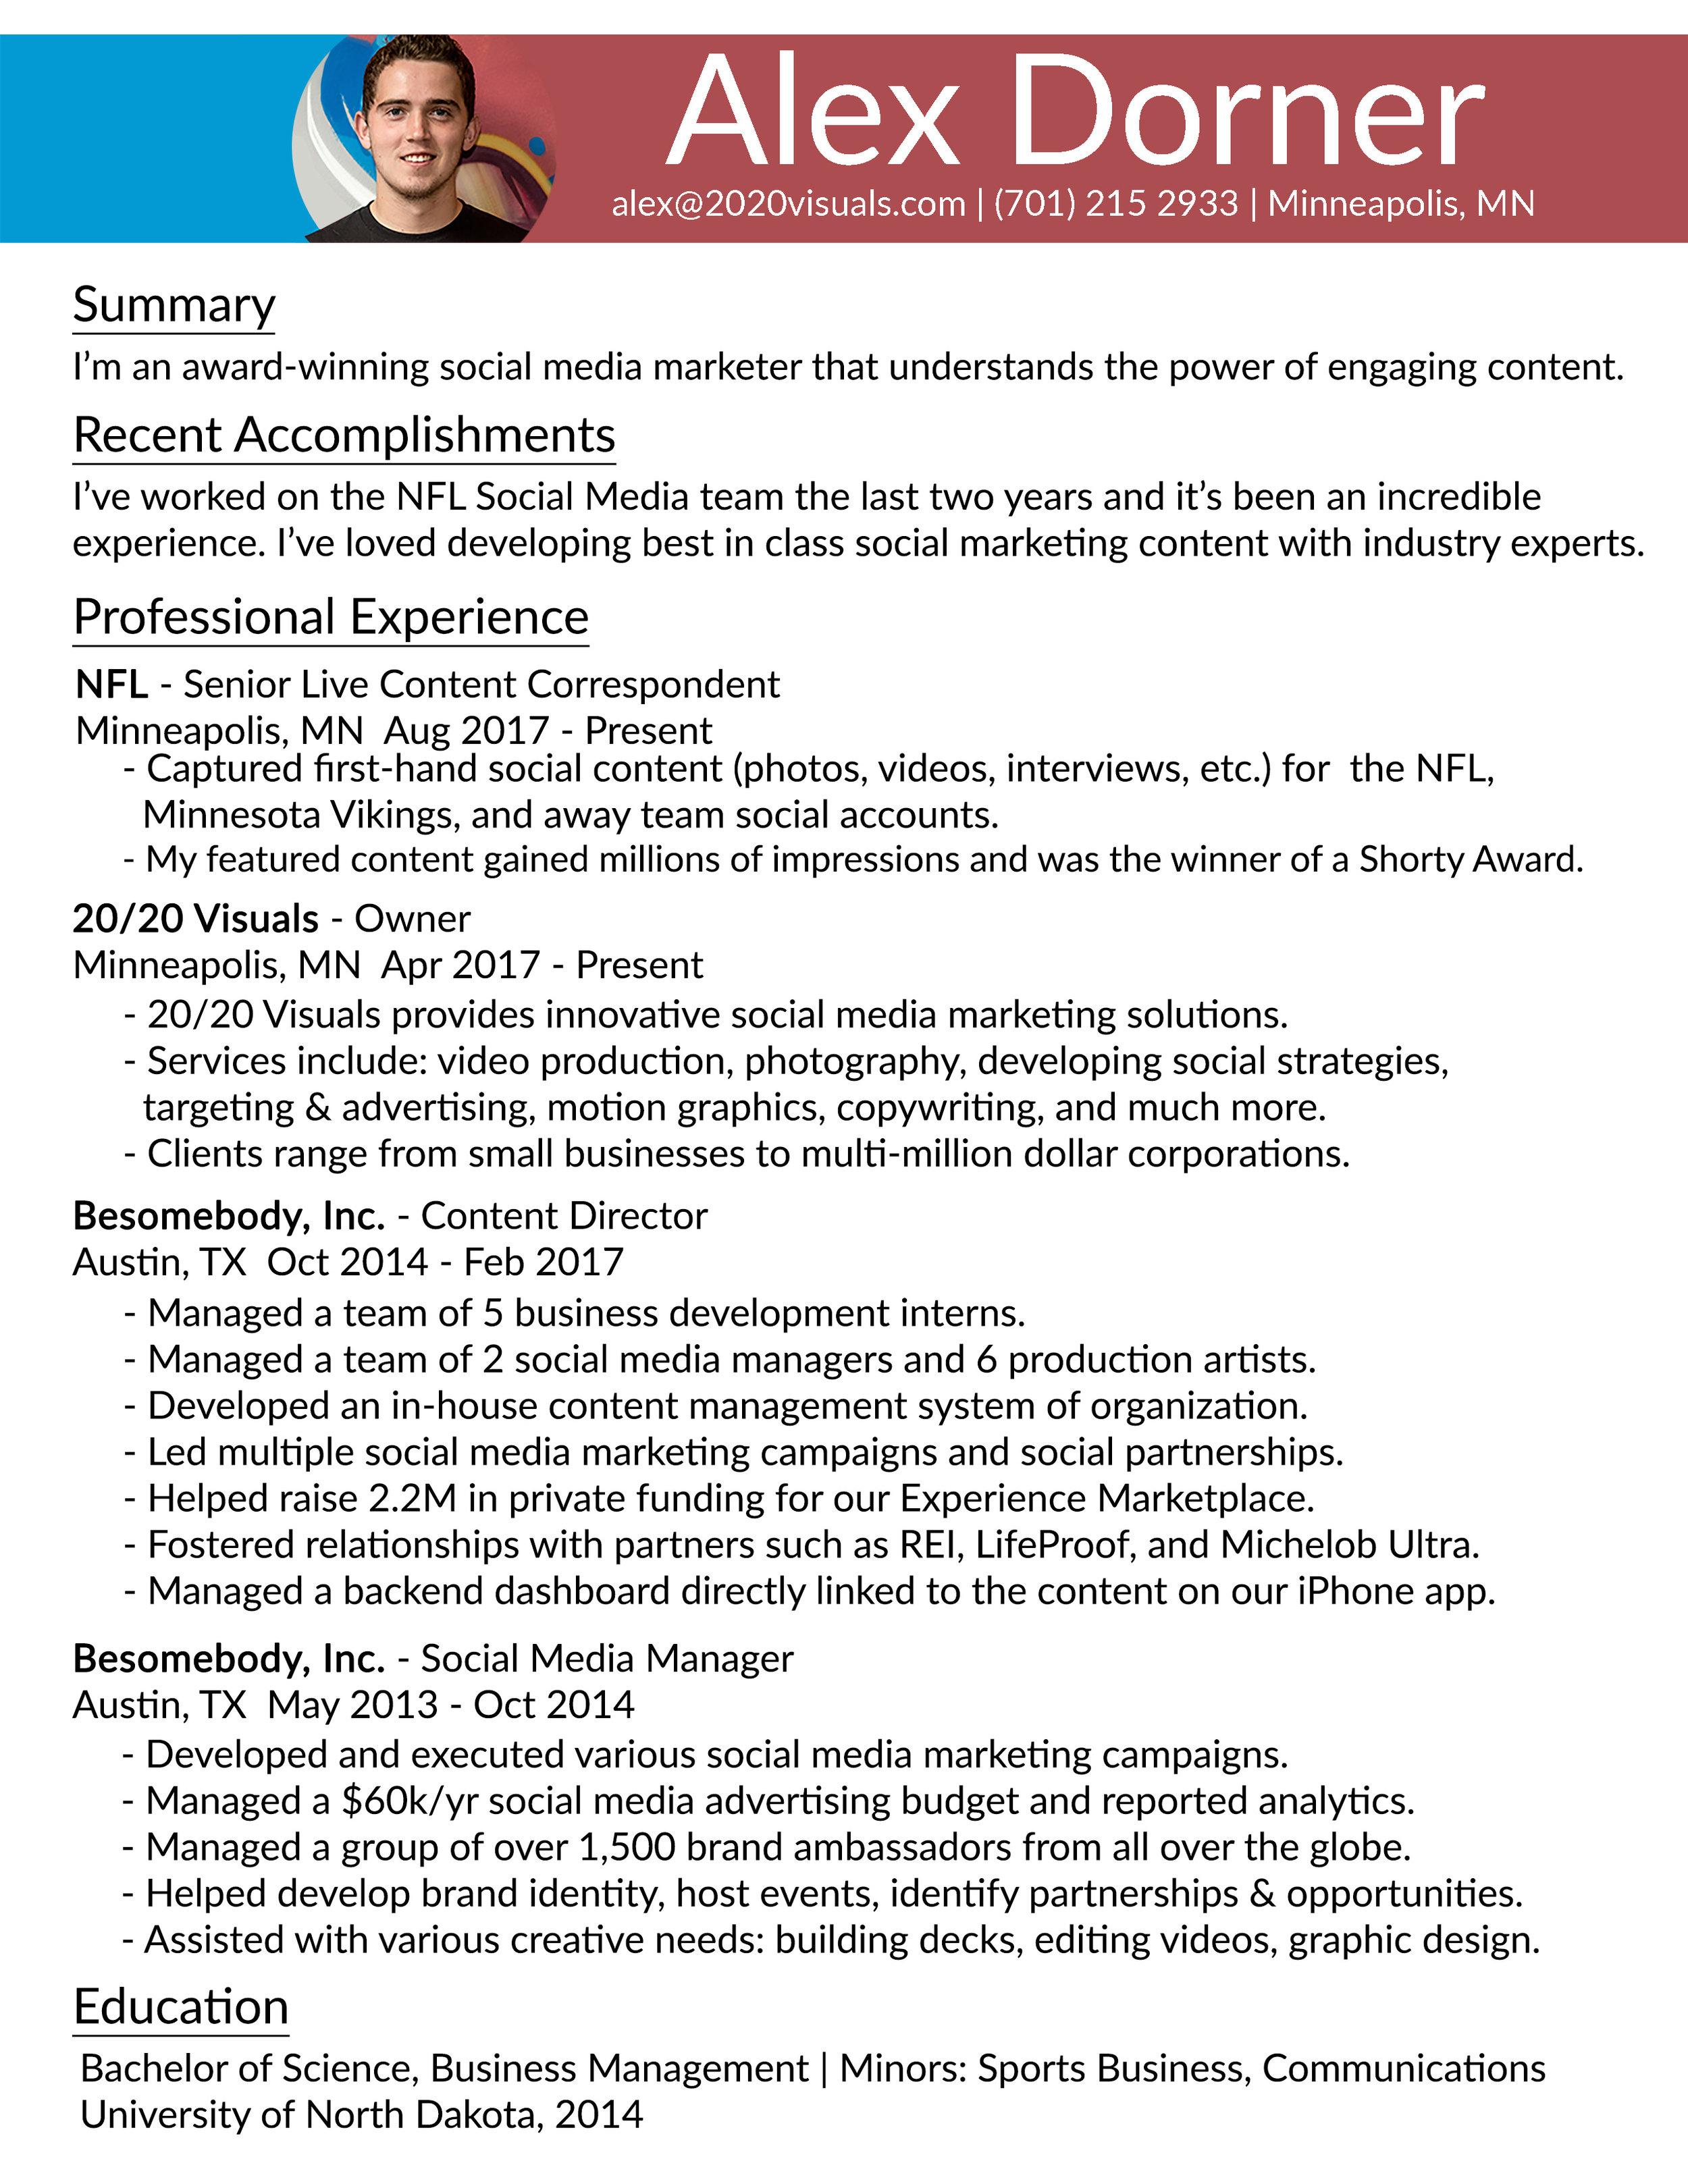 AD-resume.jpg